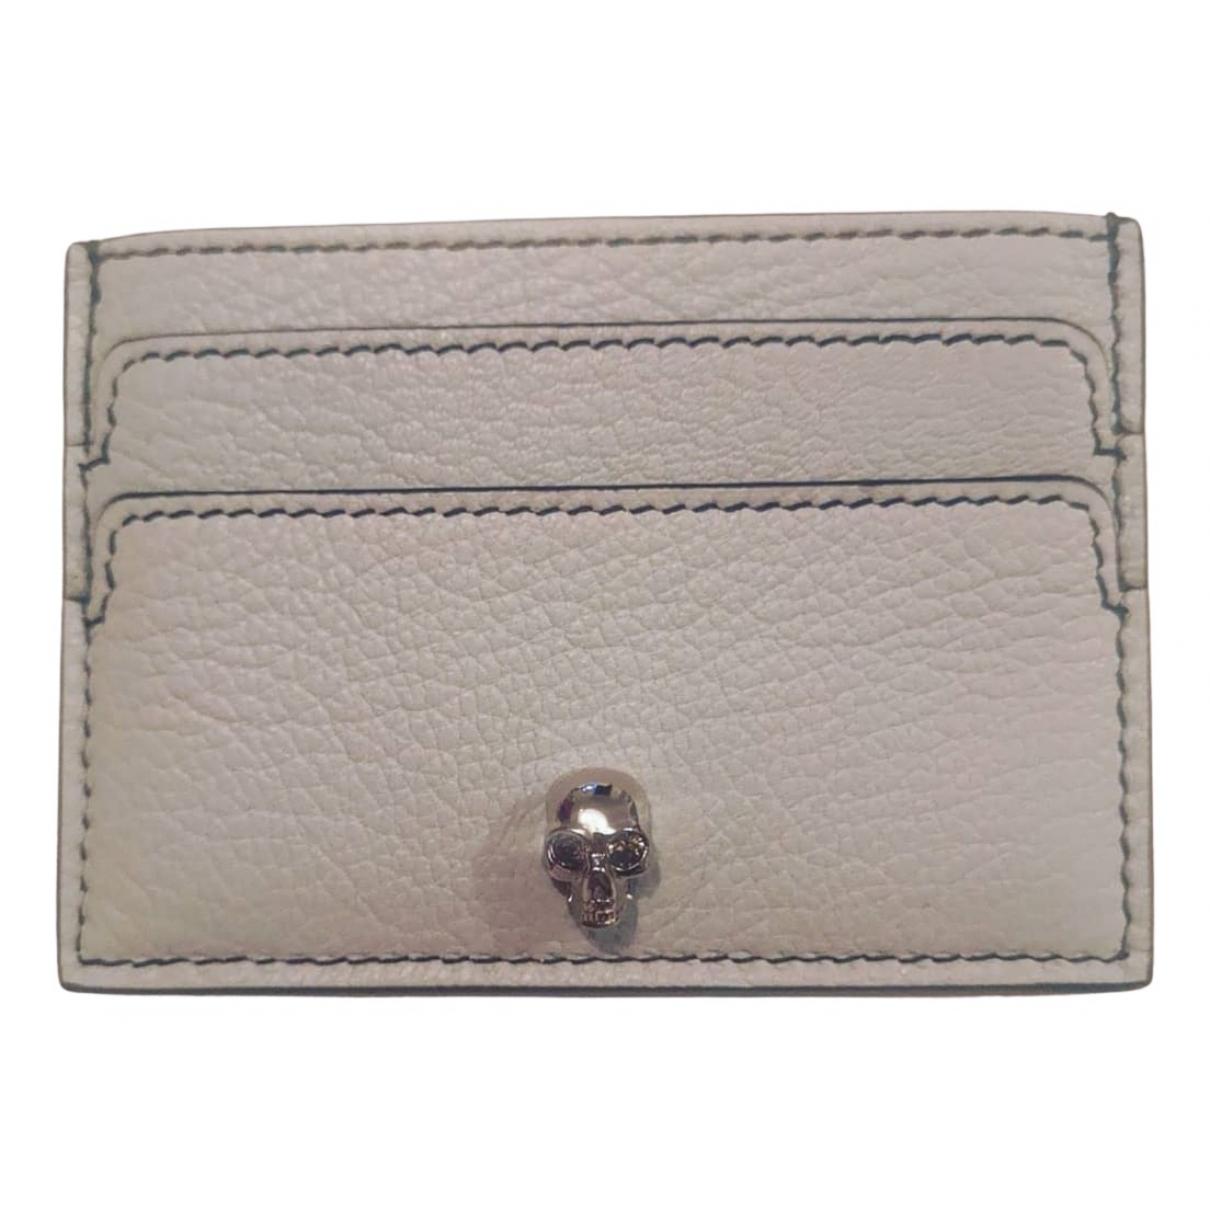 Alexander Mcqueen N Blue Leather Purses, wallet & cases for Women N